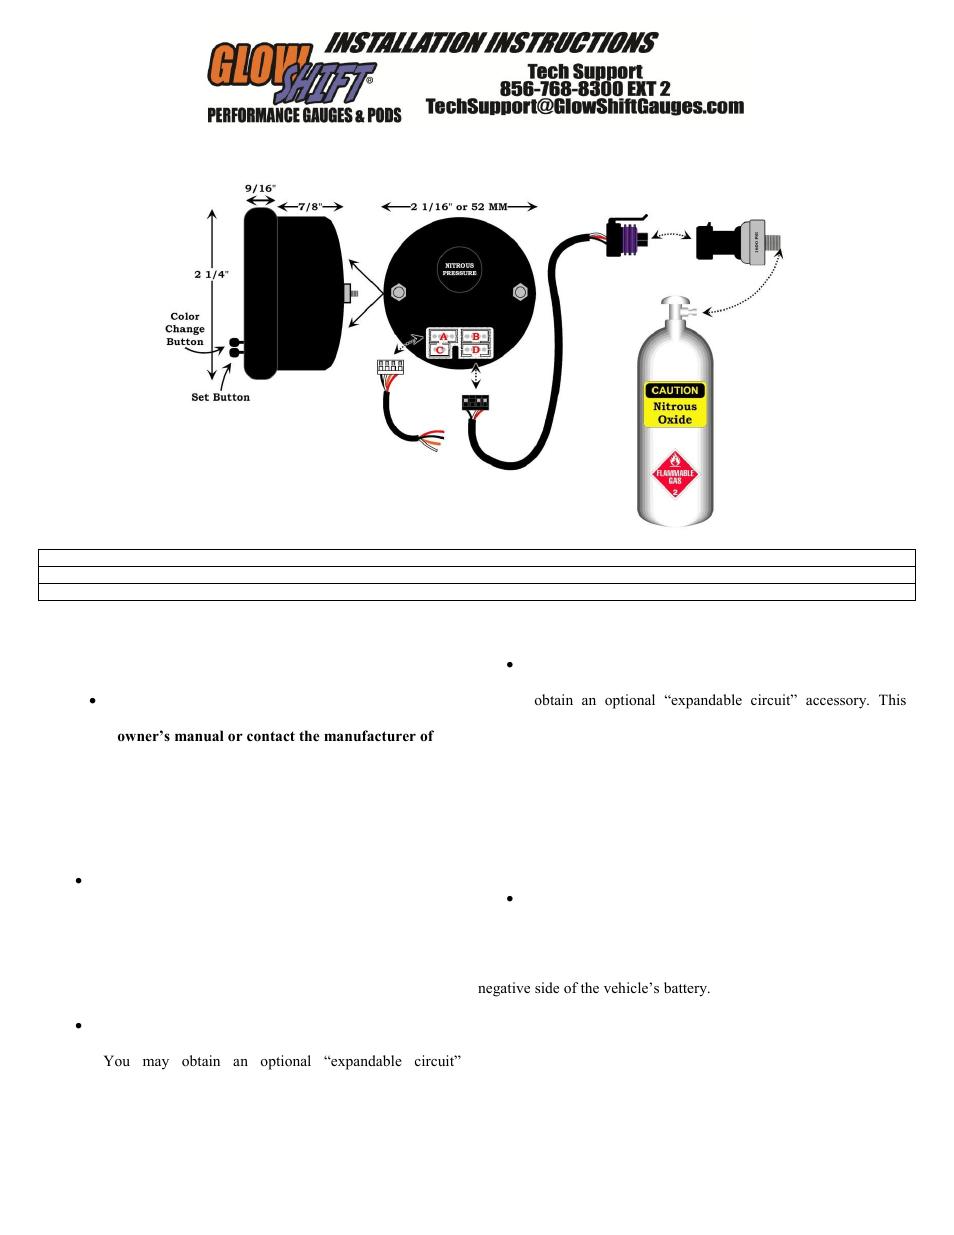 nitrous water temp gauge wiring diagram light switch 6 stromoeko de glowshift air fuel ratio 8 10 u2022 rh oxide